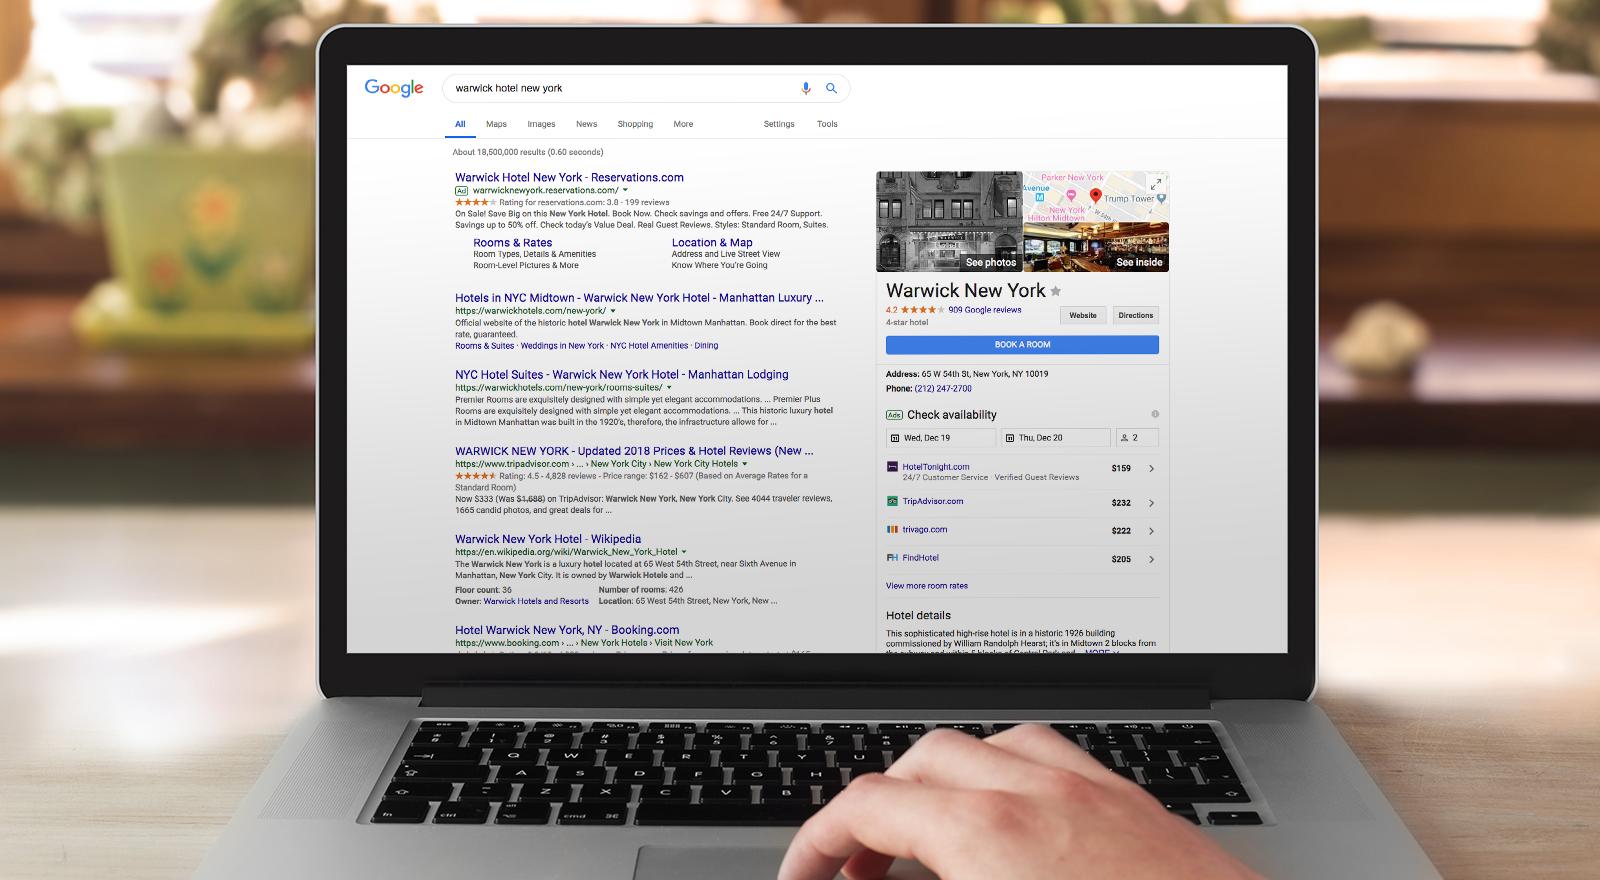 Warwick google page on computer